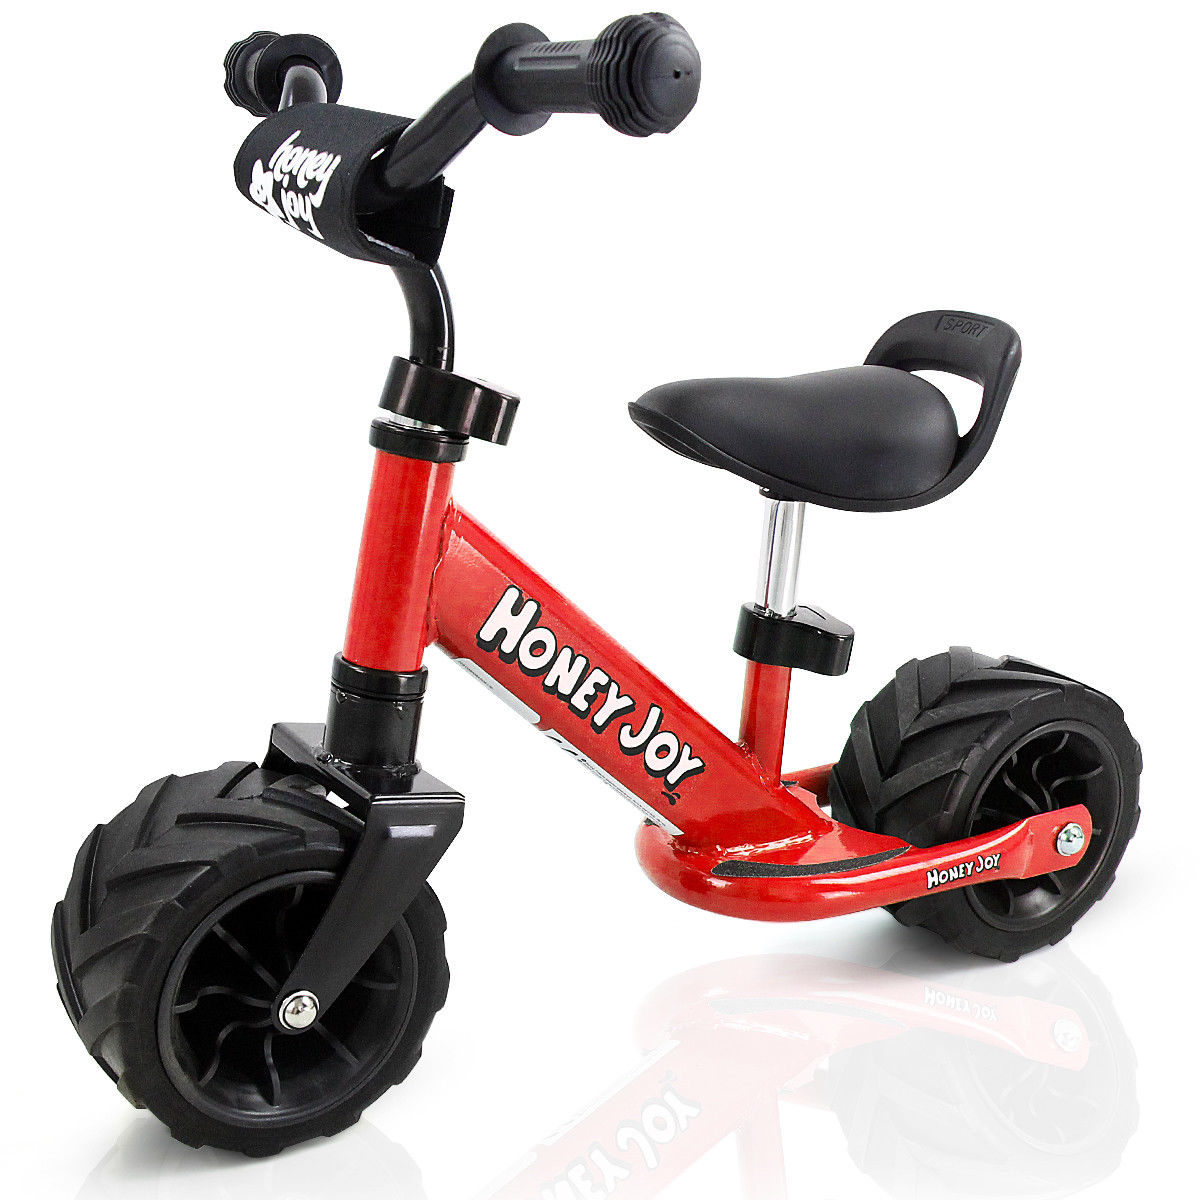 Goplus 6.5'' Kids Balance Bike No Pedal Adjustable Height Wide PU Tire Cycling Training